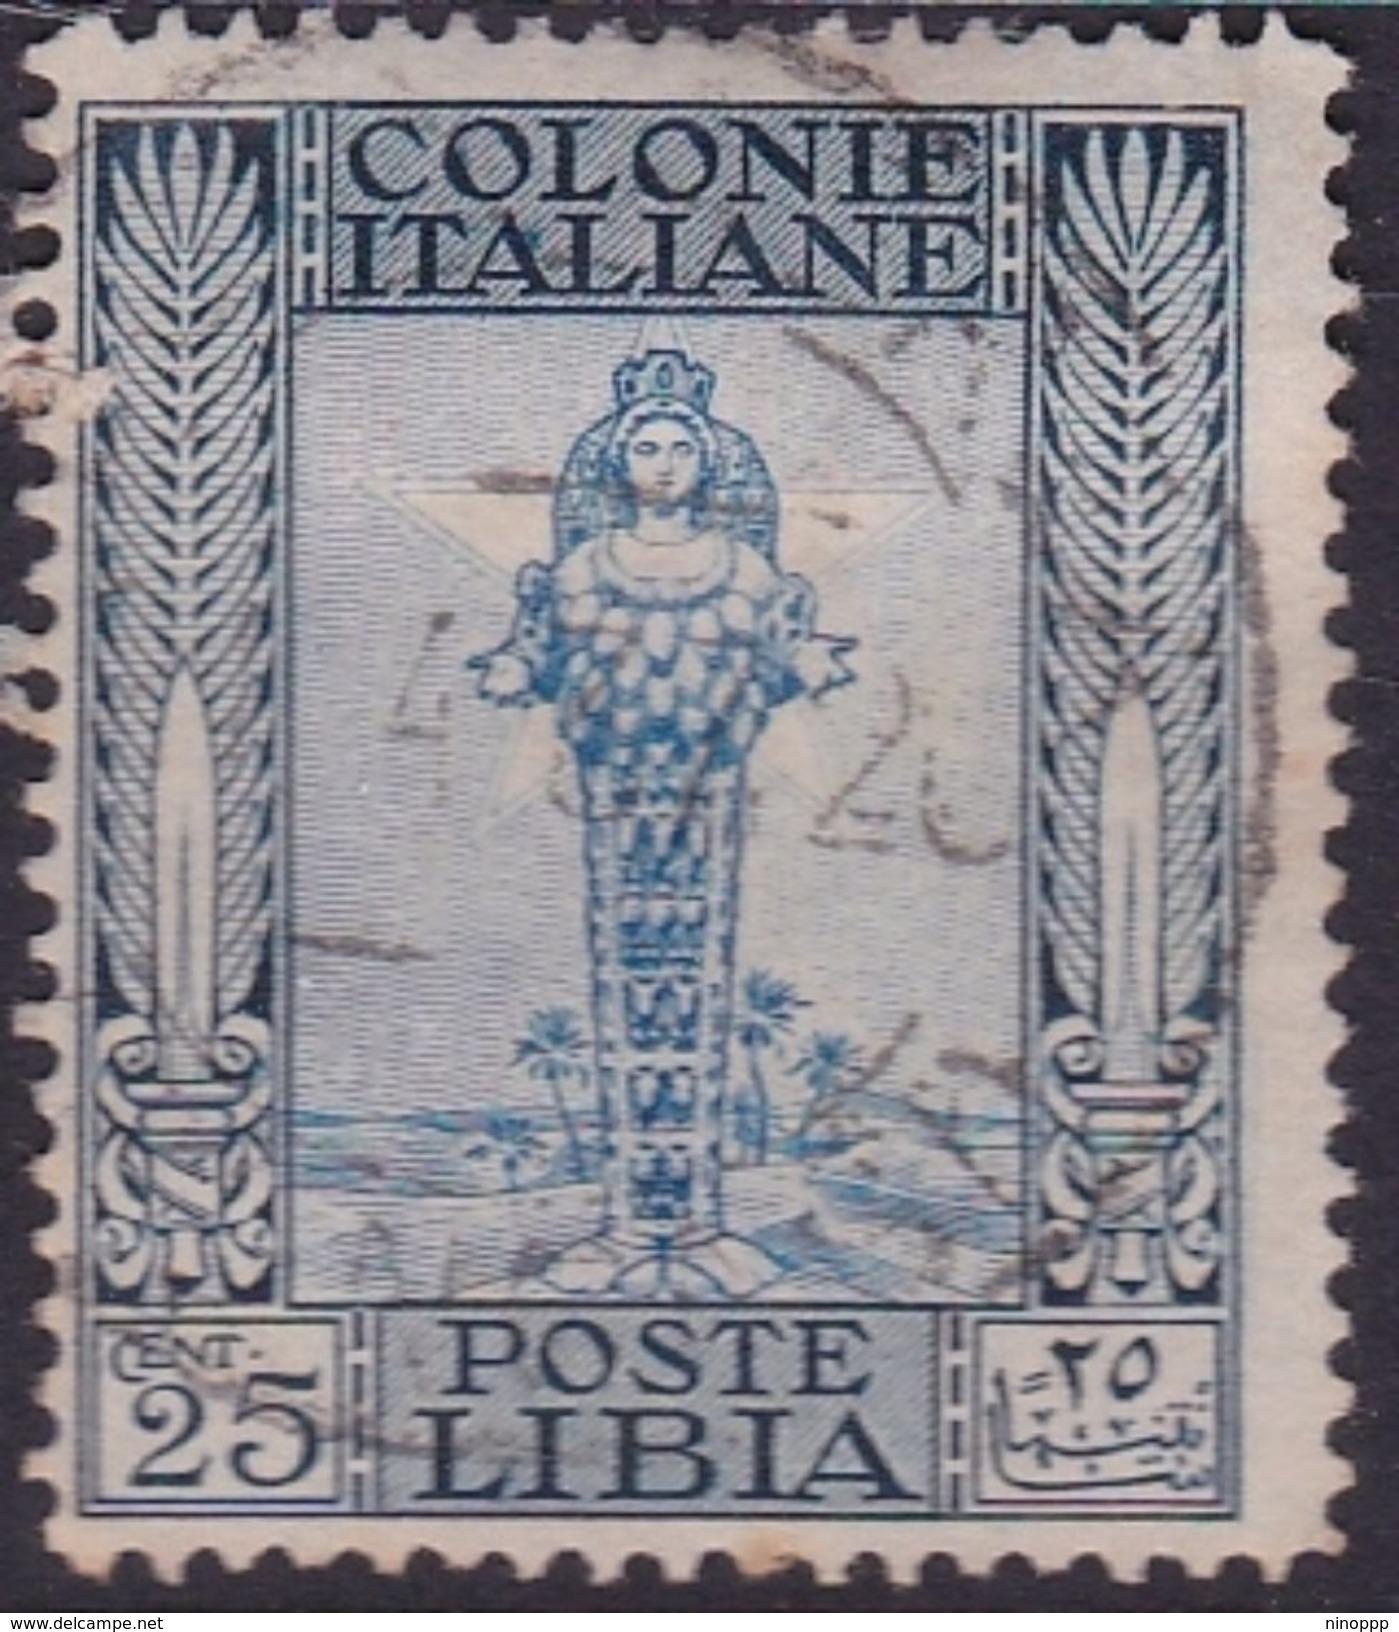 Italy-Colonies And Territories-Libya S 49 1924-29 ,Pictorials No Watermark,25c Diana Of Ephesus,used - Libya